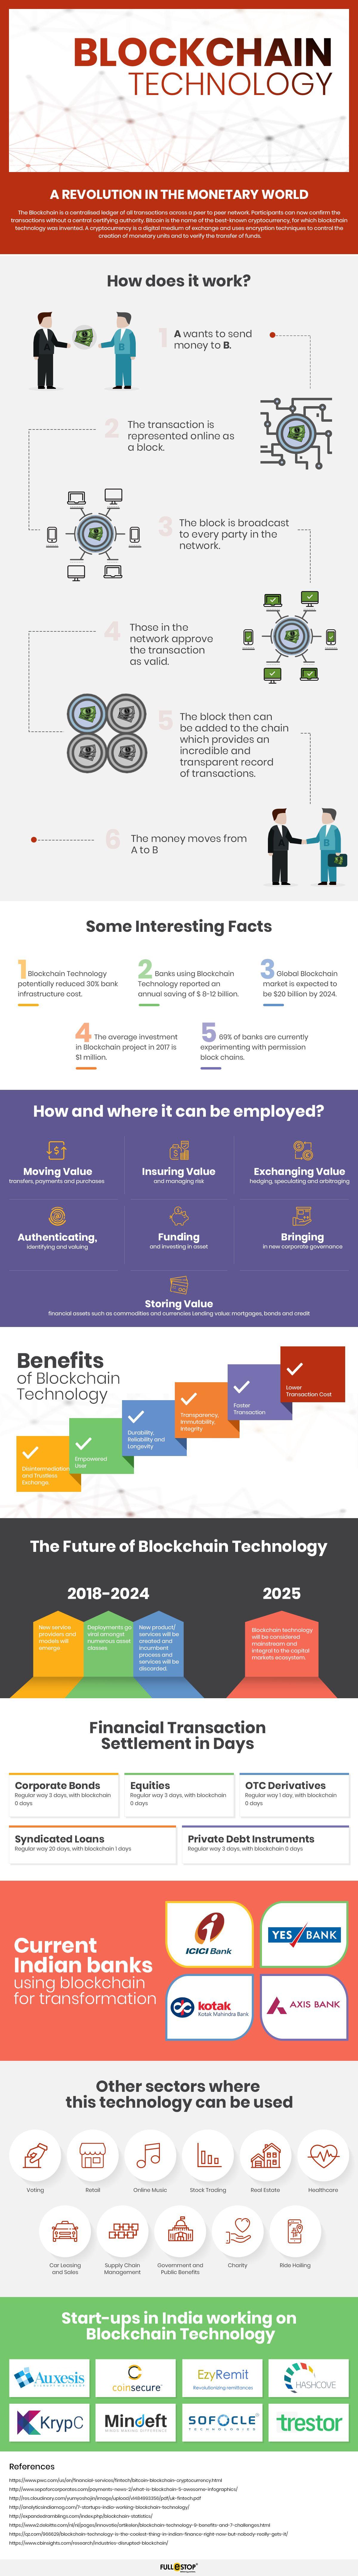 blockchain technology - About Blockchain Technology